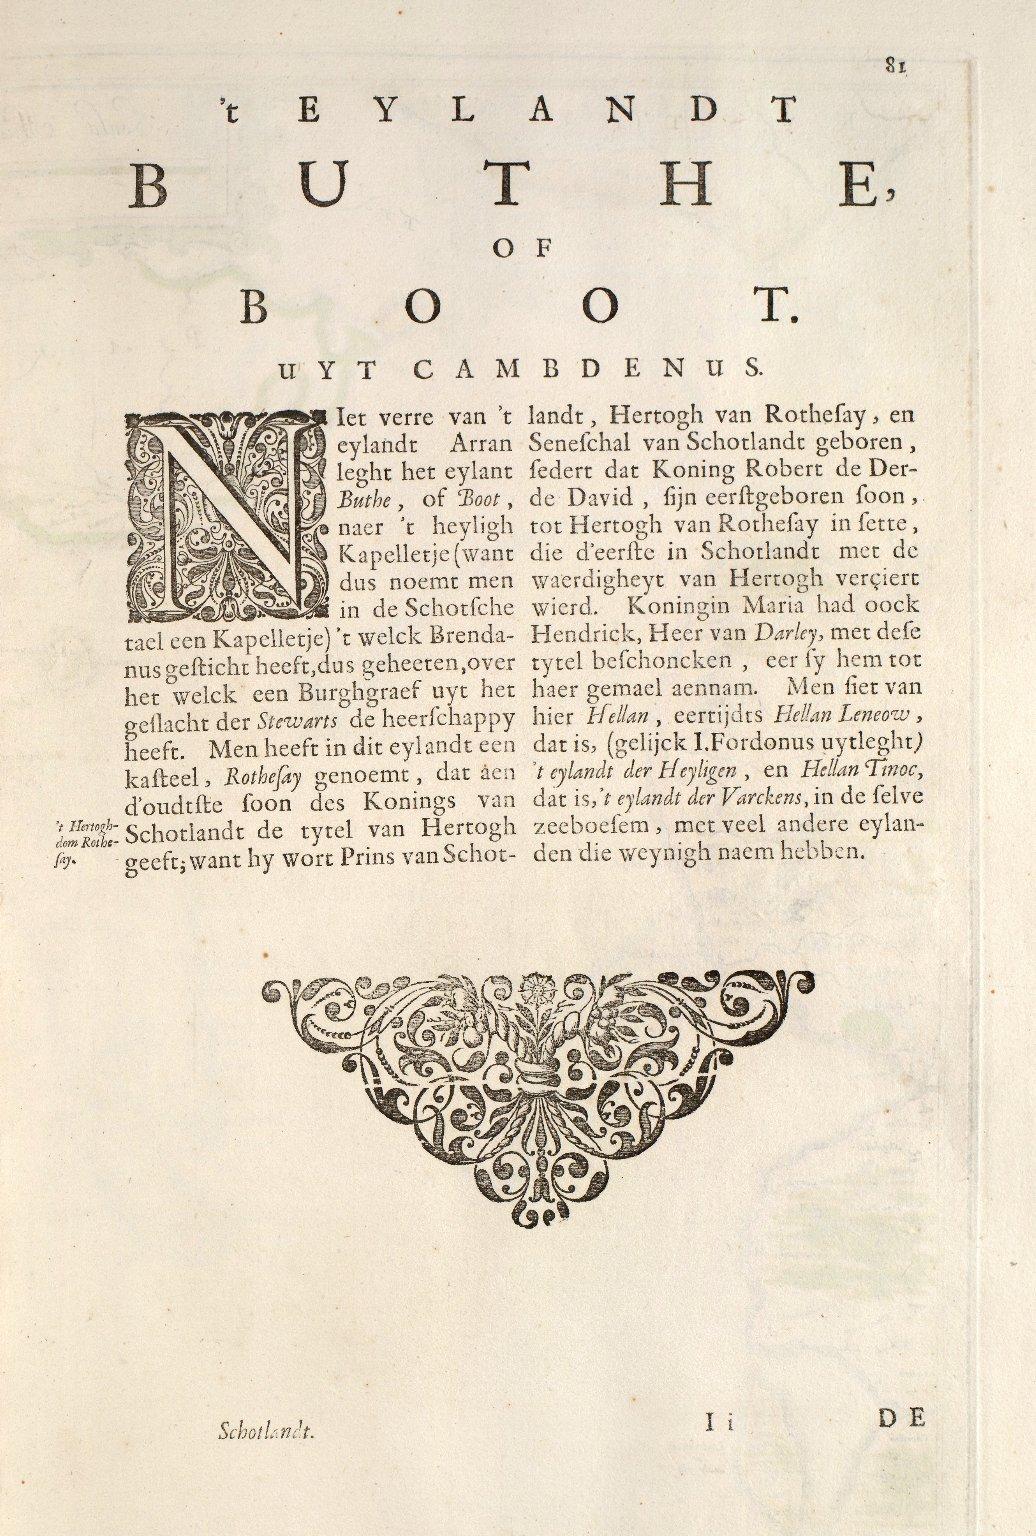 [Geographiae Blavianae] [Also known as: Atlas major] [071 of 153]